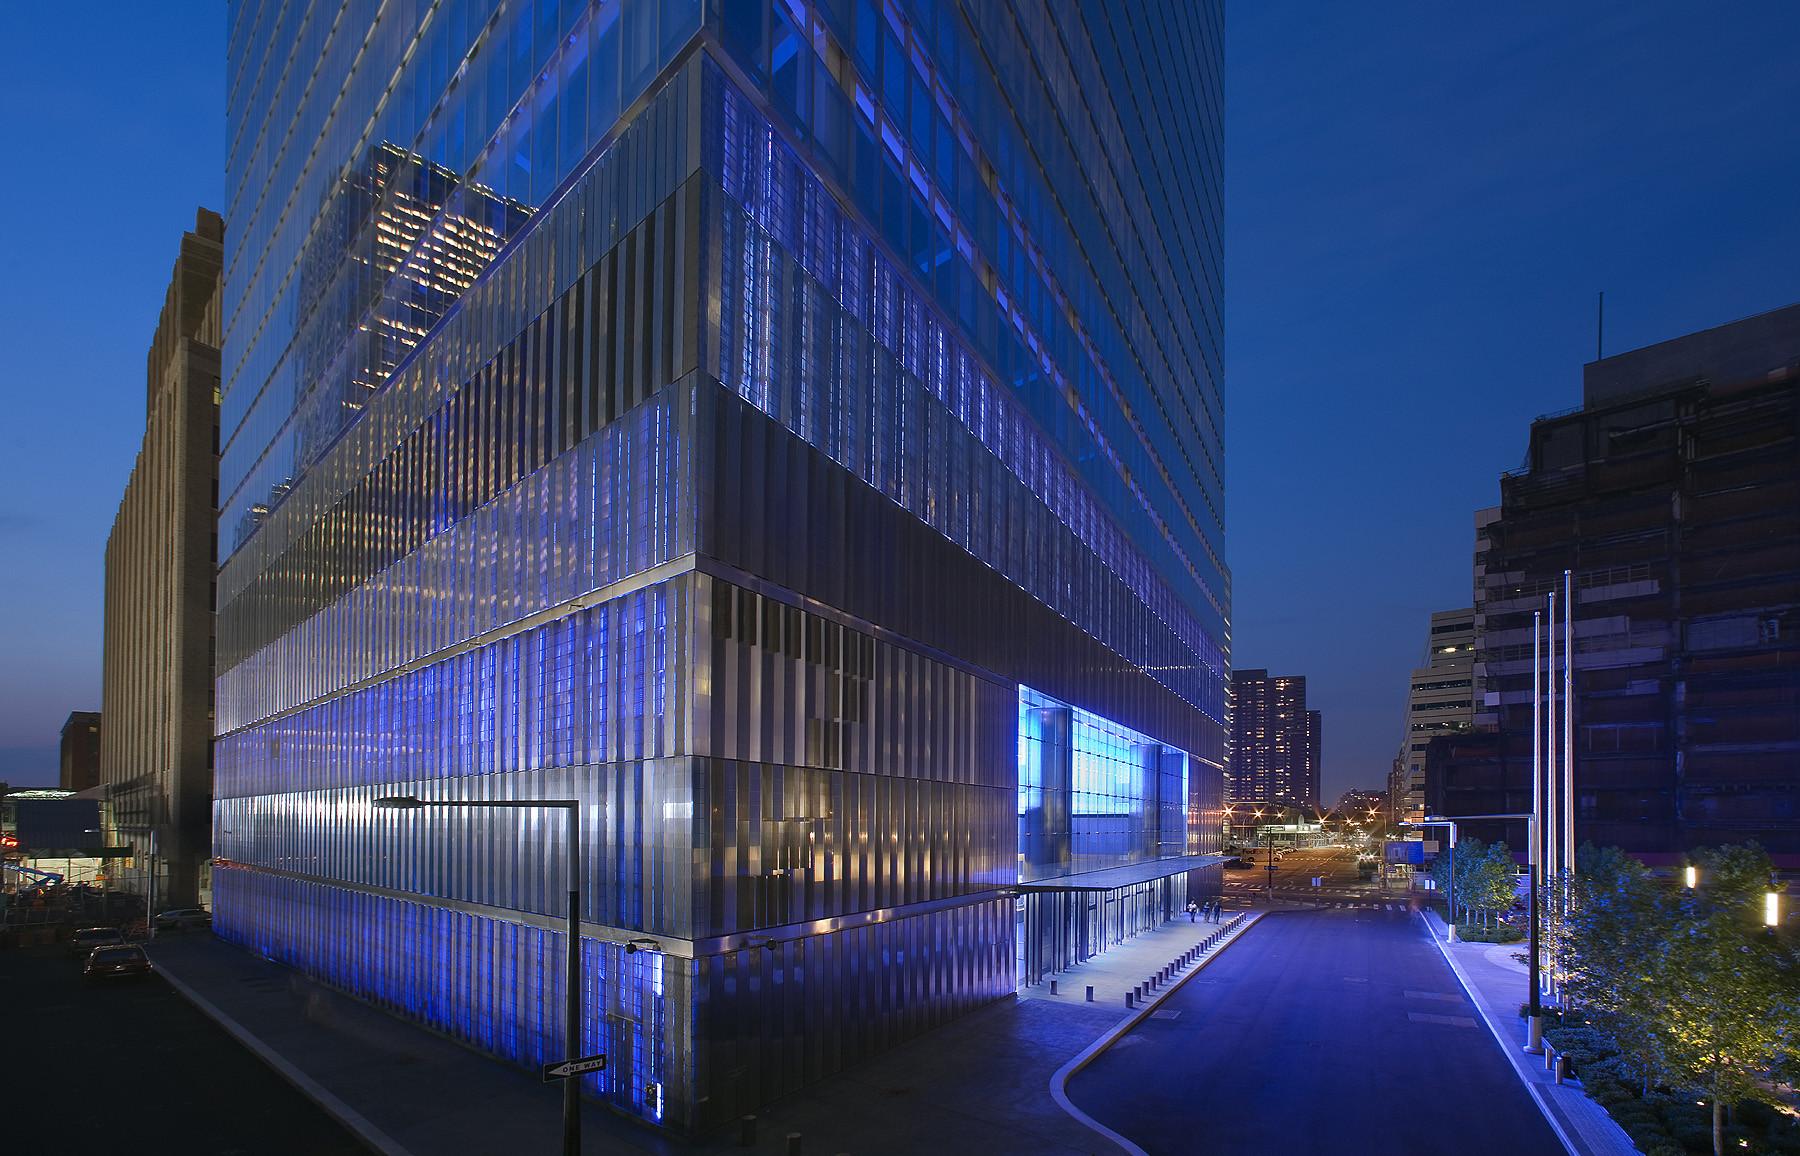 Light Matters: Glass Beyond Transparency with James Carpenter, 7 World Trade Center. New York, NY 2003-2007. Image © David Sundberg